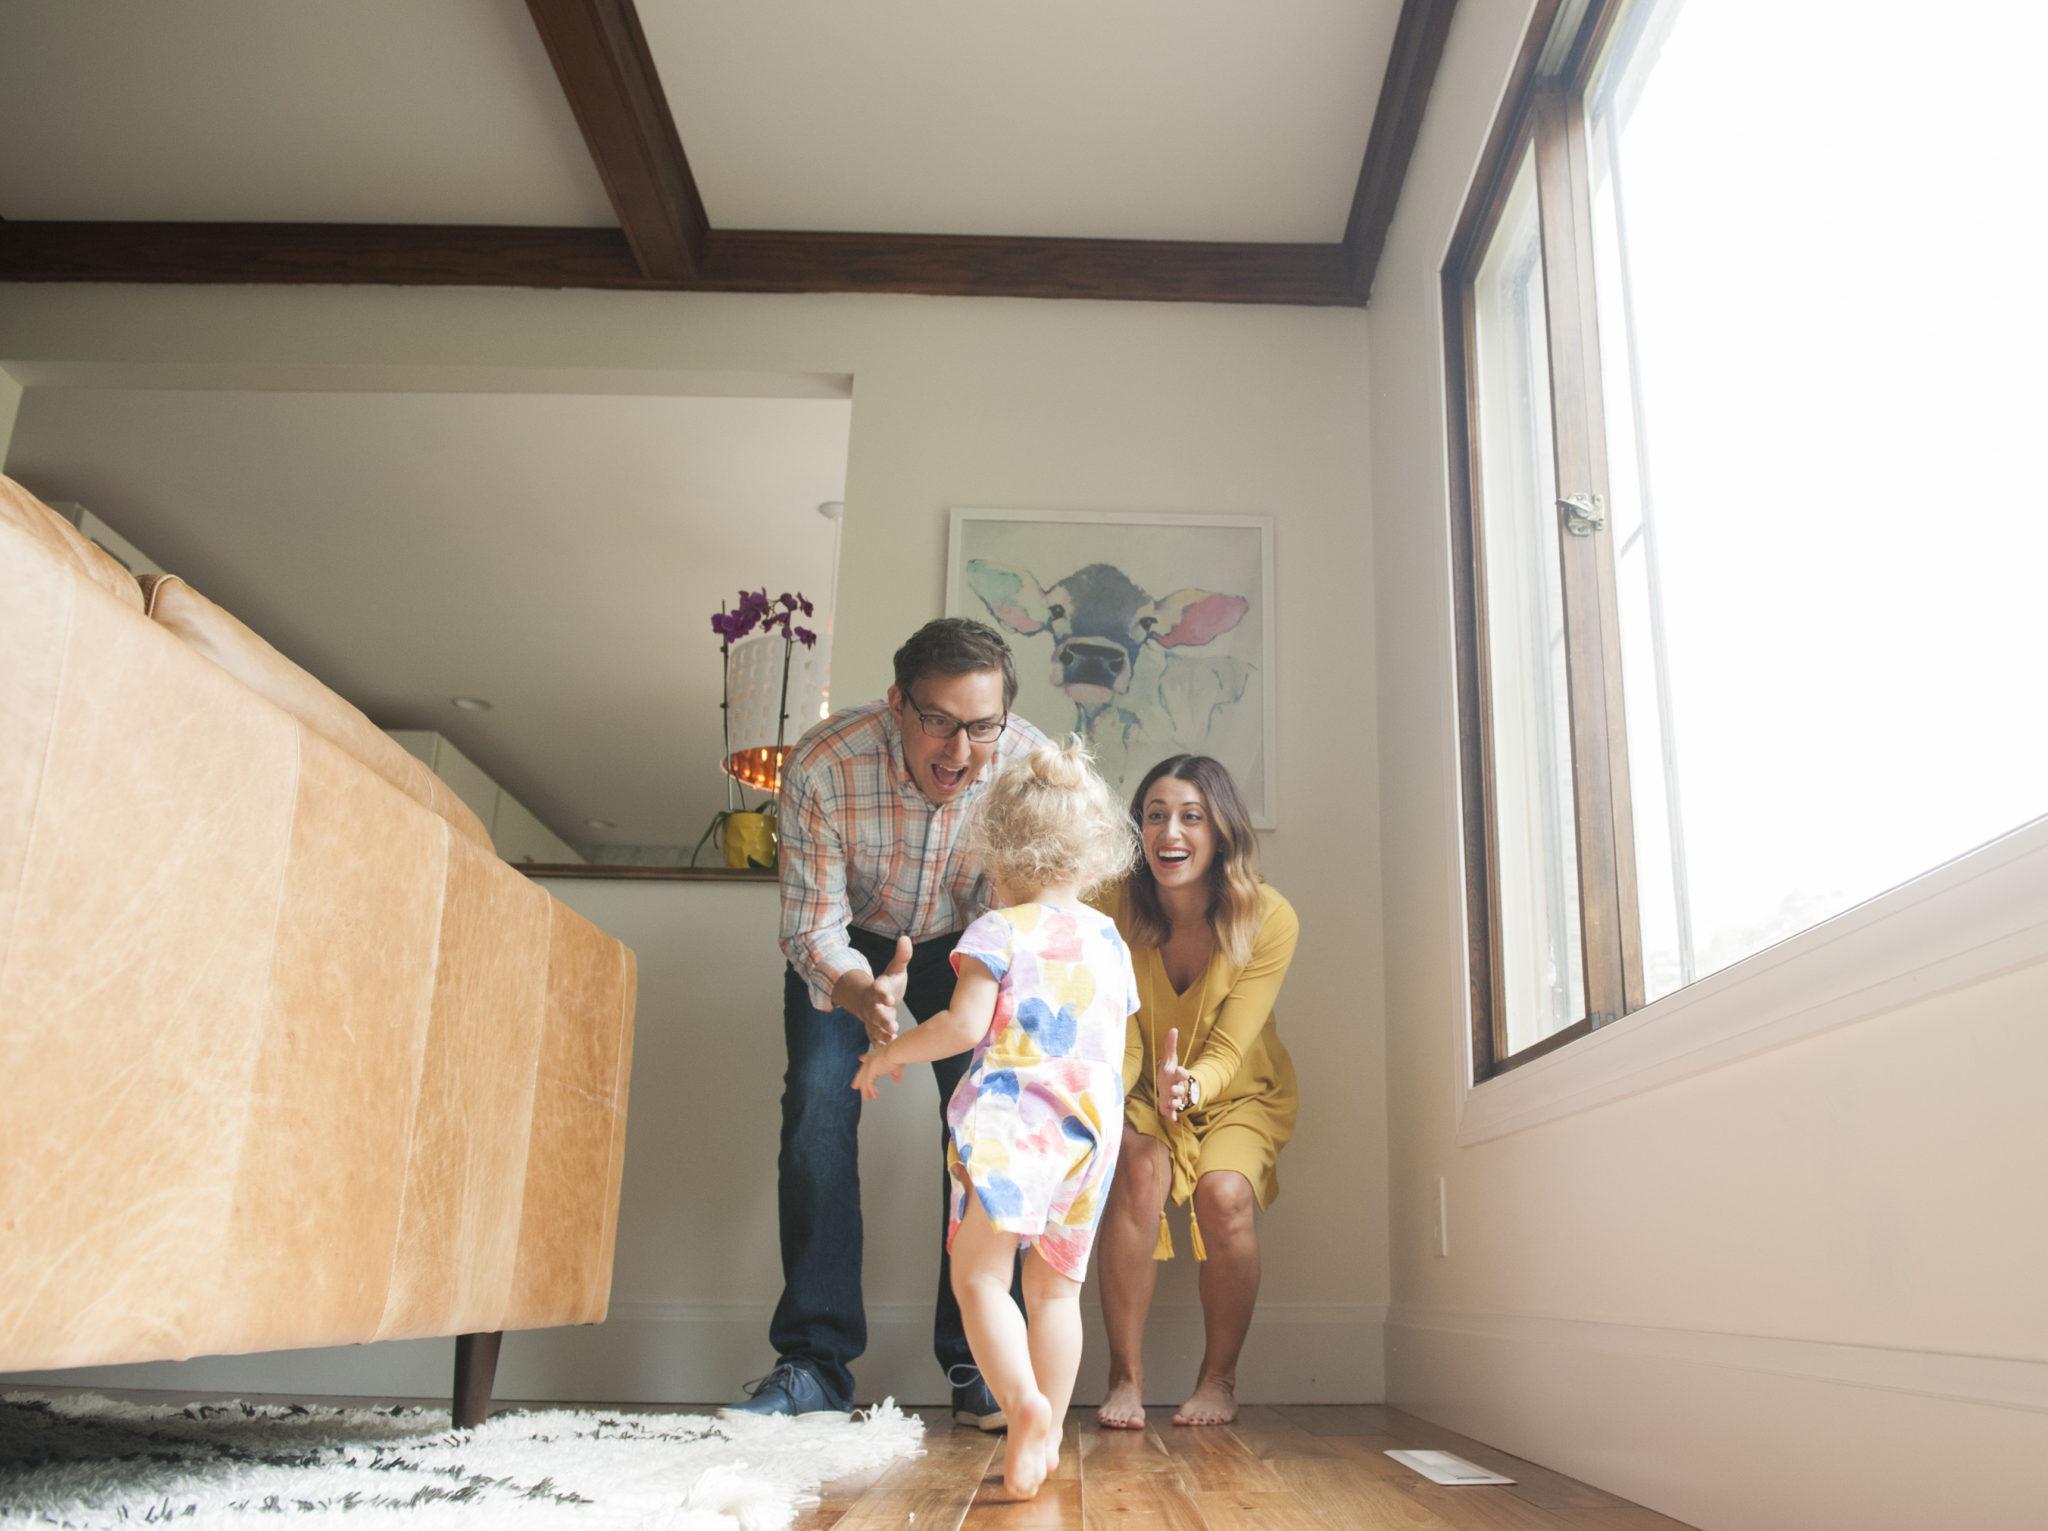 lifestyle family photography session on allweareblog.com